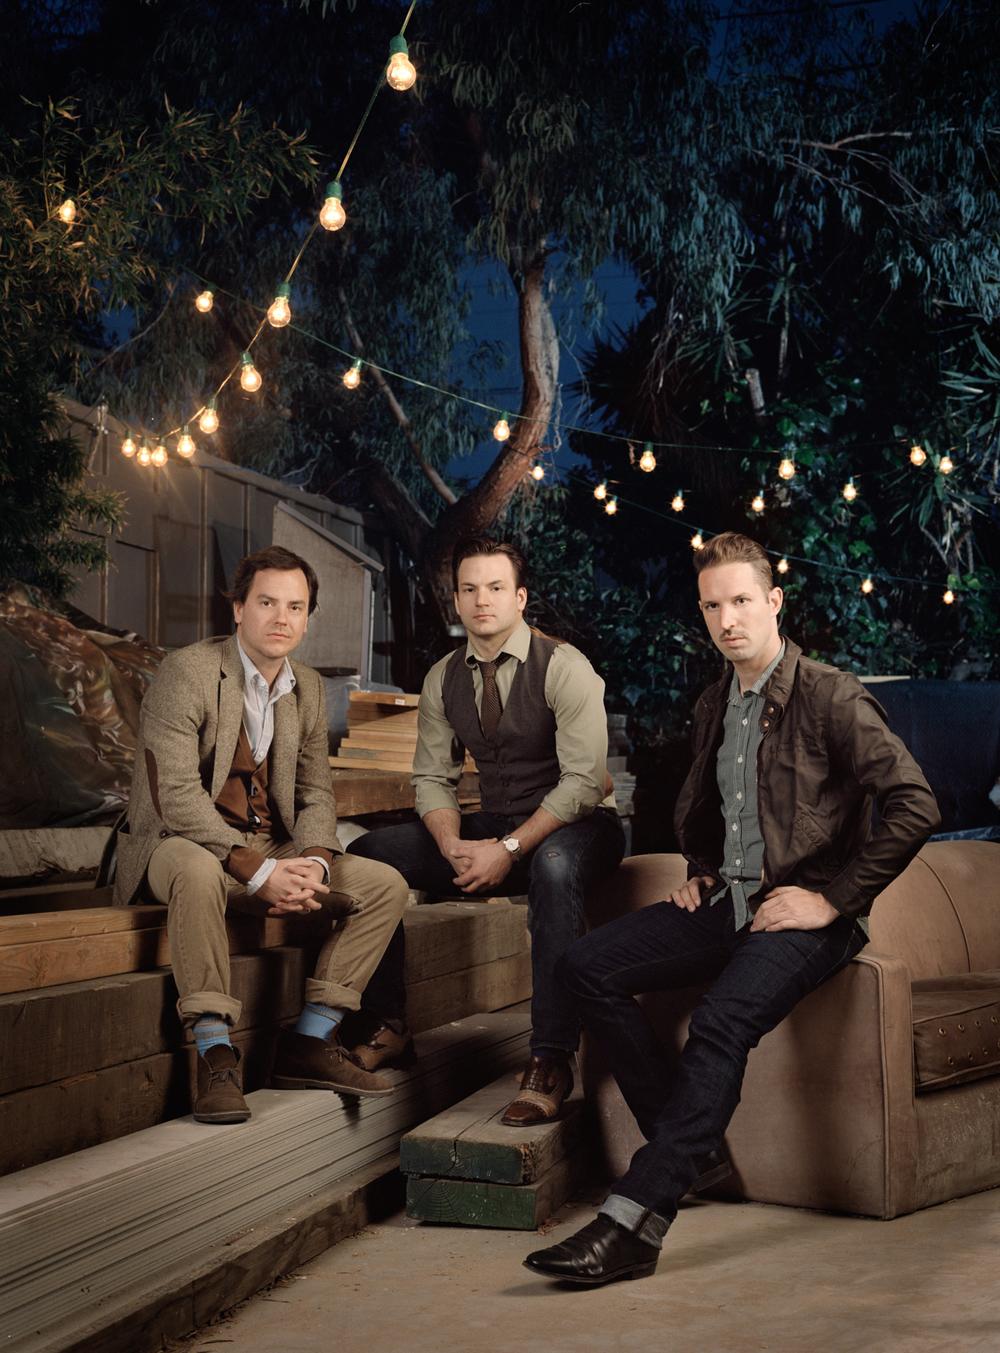 Ryan Schude, Collins Schude, and Dan Busta, 2012